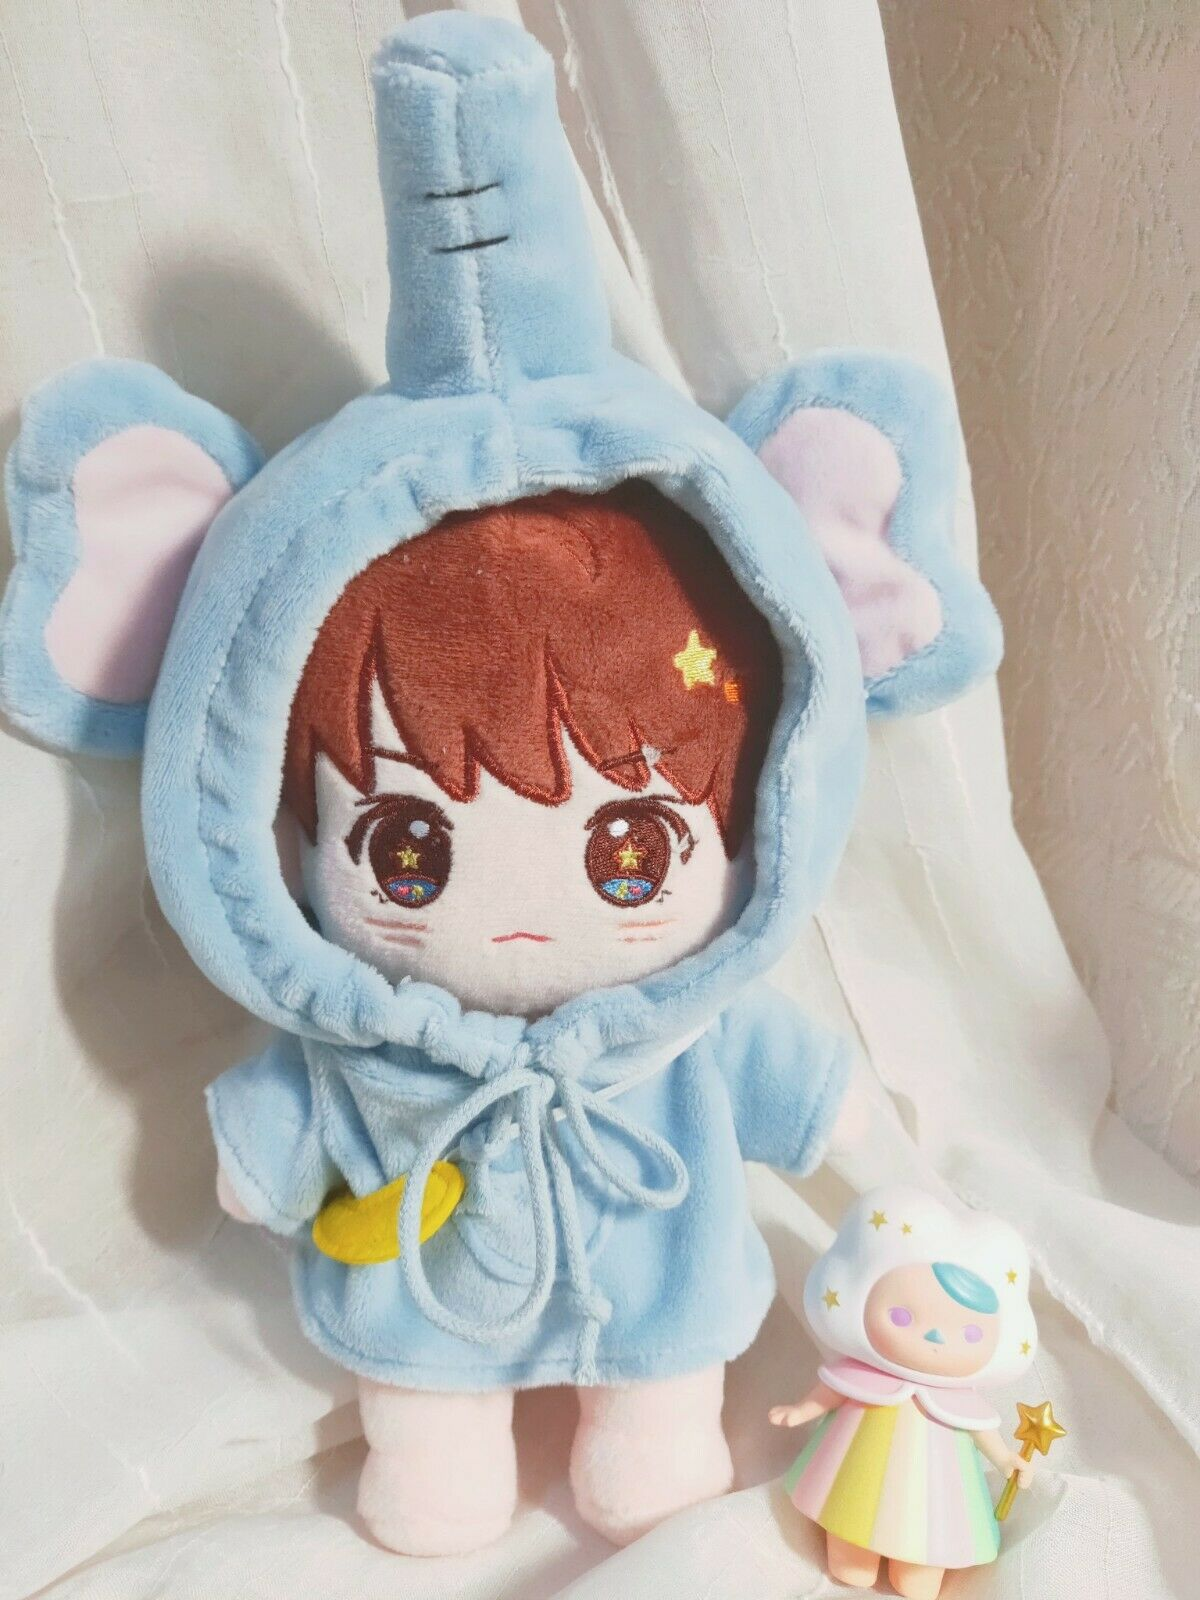 Hand-made Kpop Wanna One Kang Daniel Doll Clothes Elephant Suit Stuffed N D1